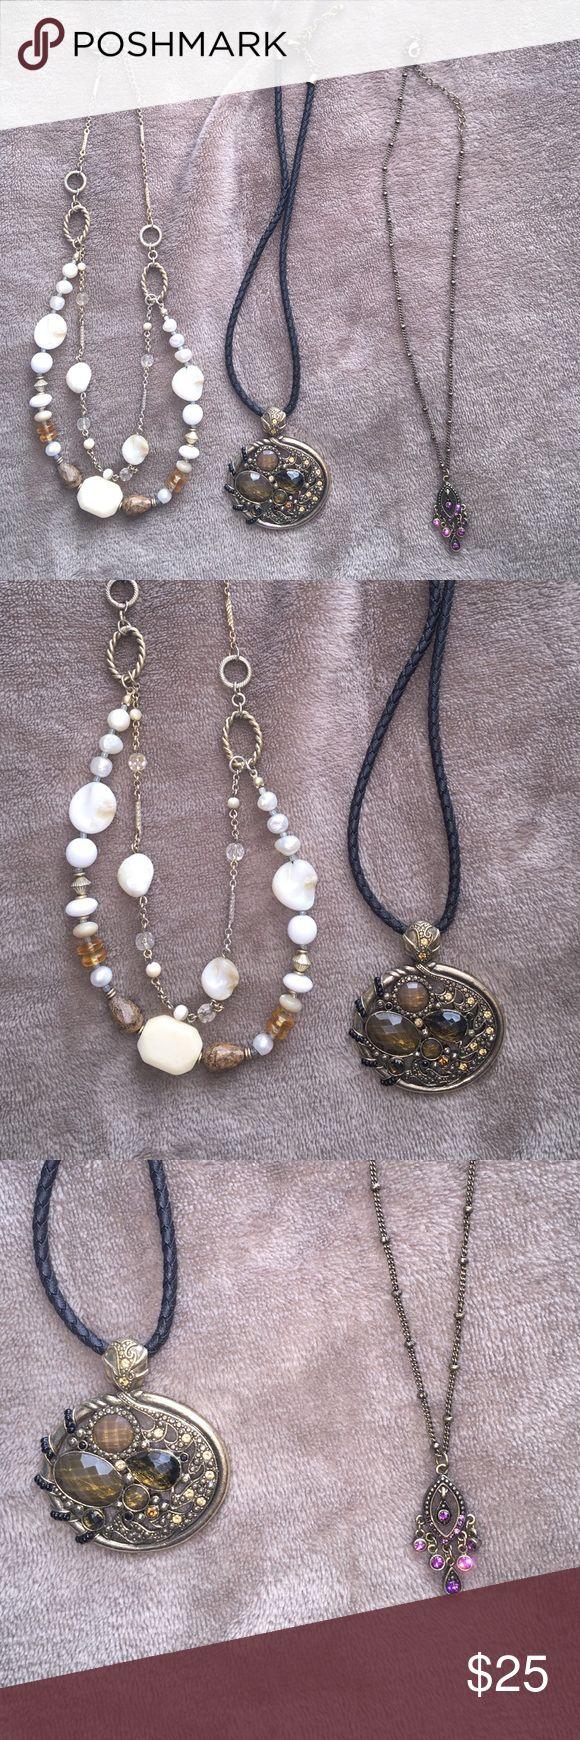 Lot of three Lia Sophia necklaces Three necklaces by Lia Sophia Lia Sophia Jewelry Necklaces